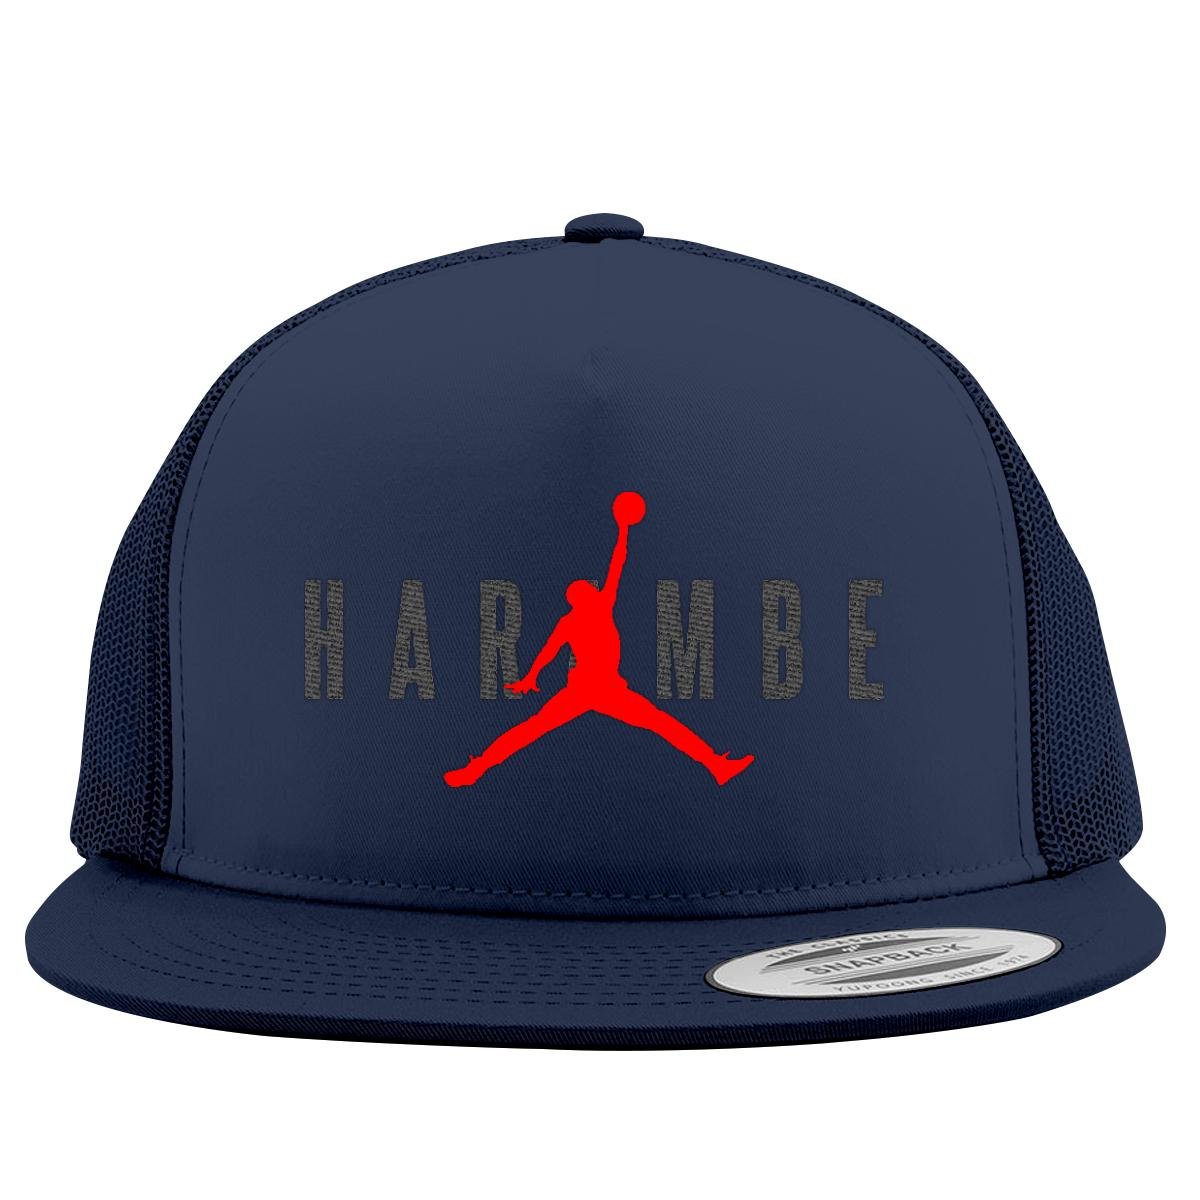 47413247e5a usa haramble x jordan trucker hat embroidered customon 24438 0ef04